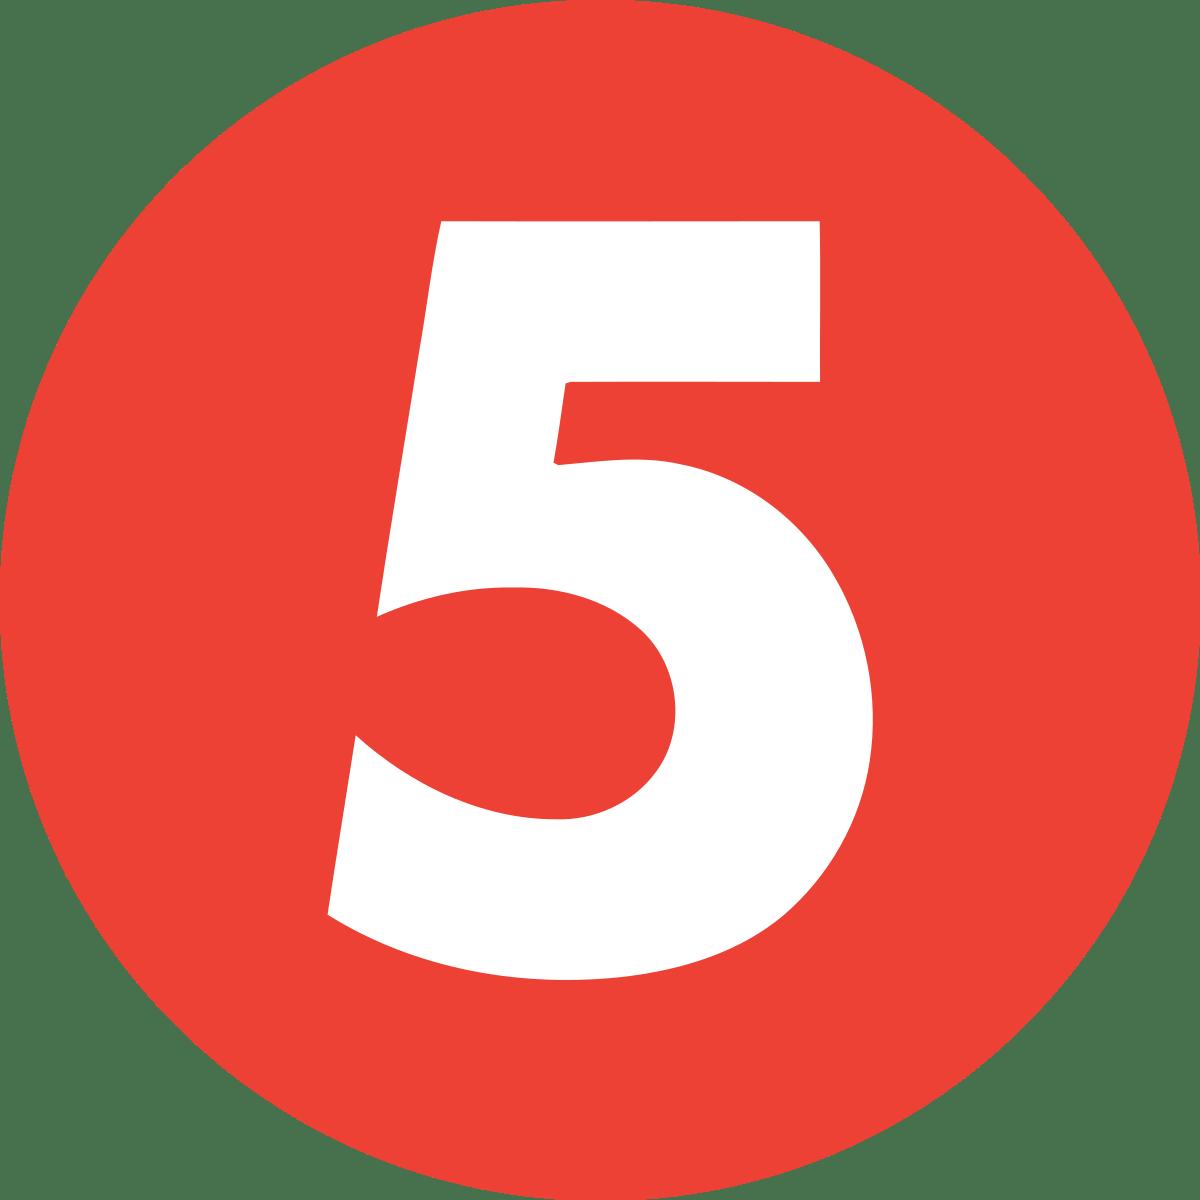 kisspng-tv5-network-philippines-television-espn-5-5ba3c1a38cf026.2339195015374585955773